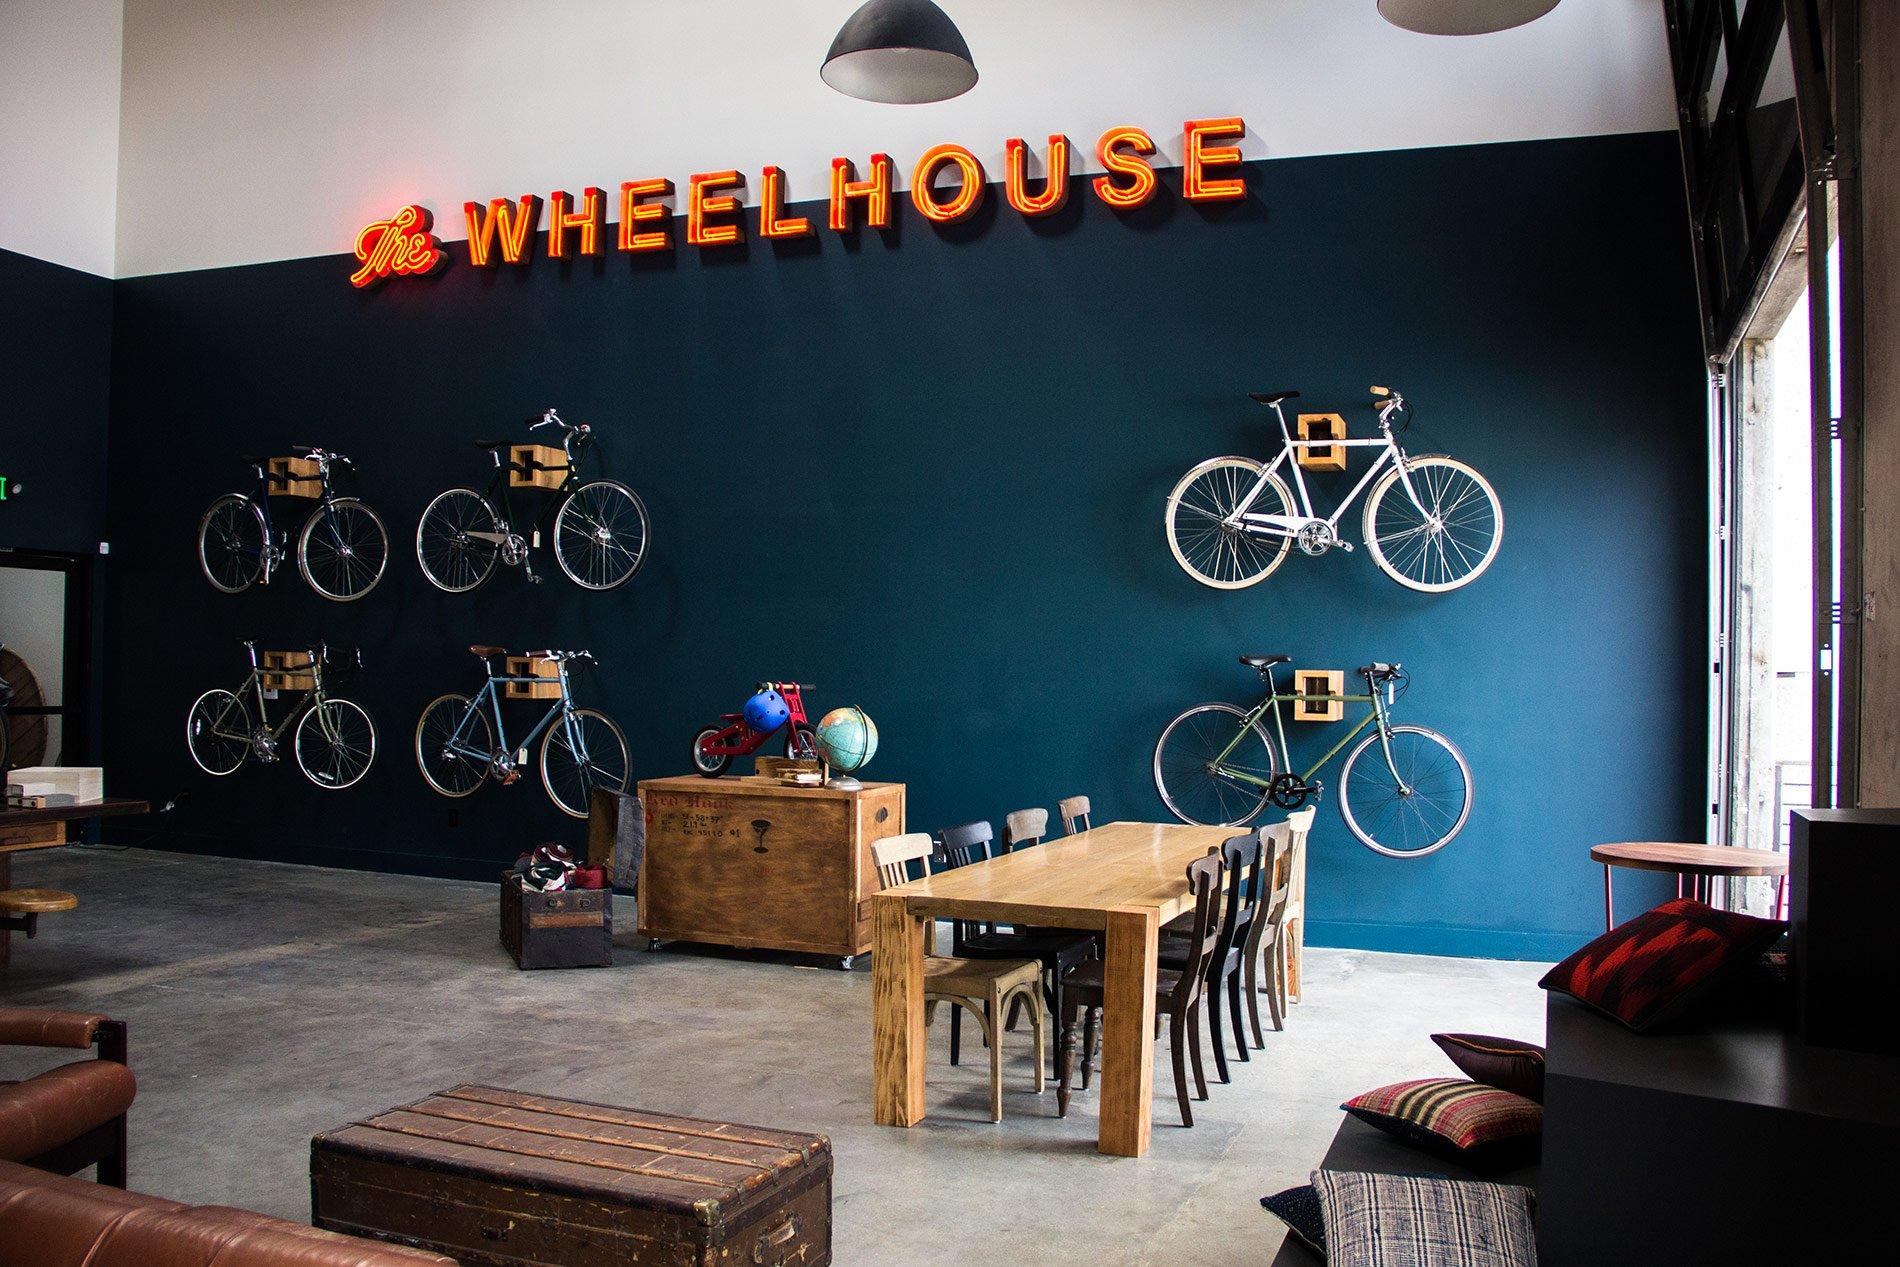 the-wheelhouse-in-los-angeles-gessato-11